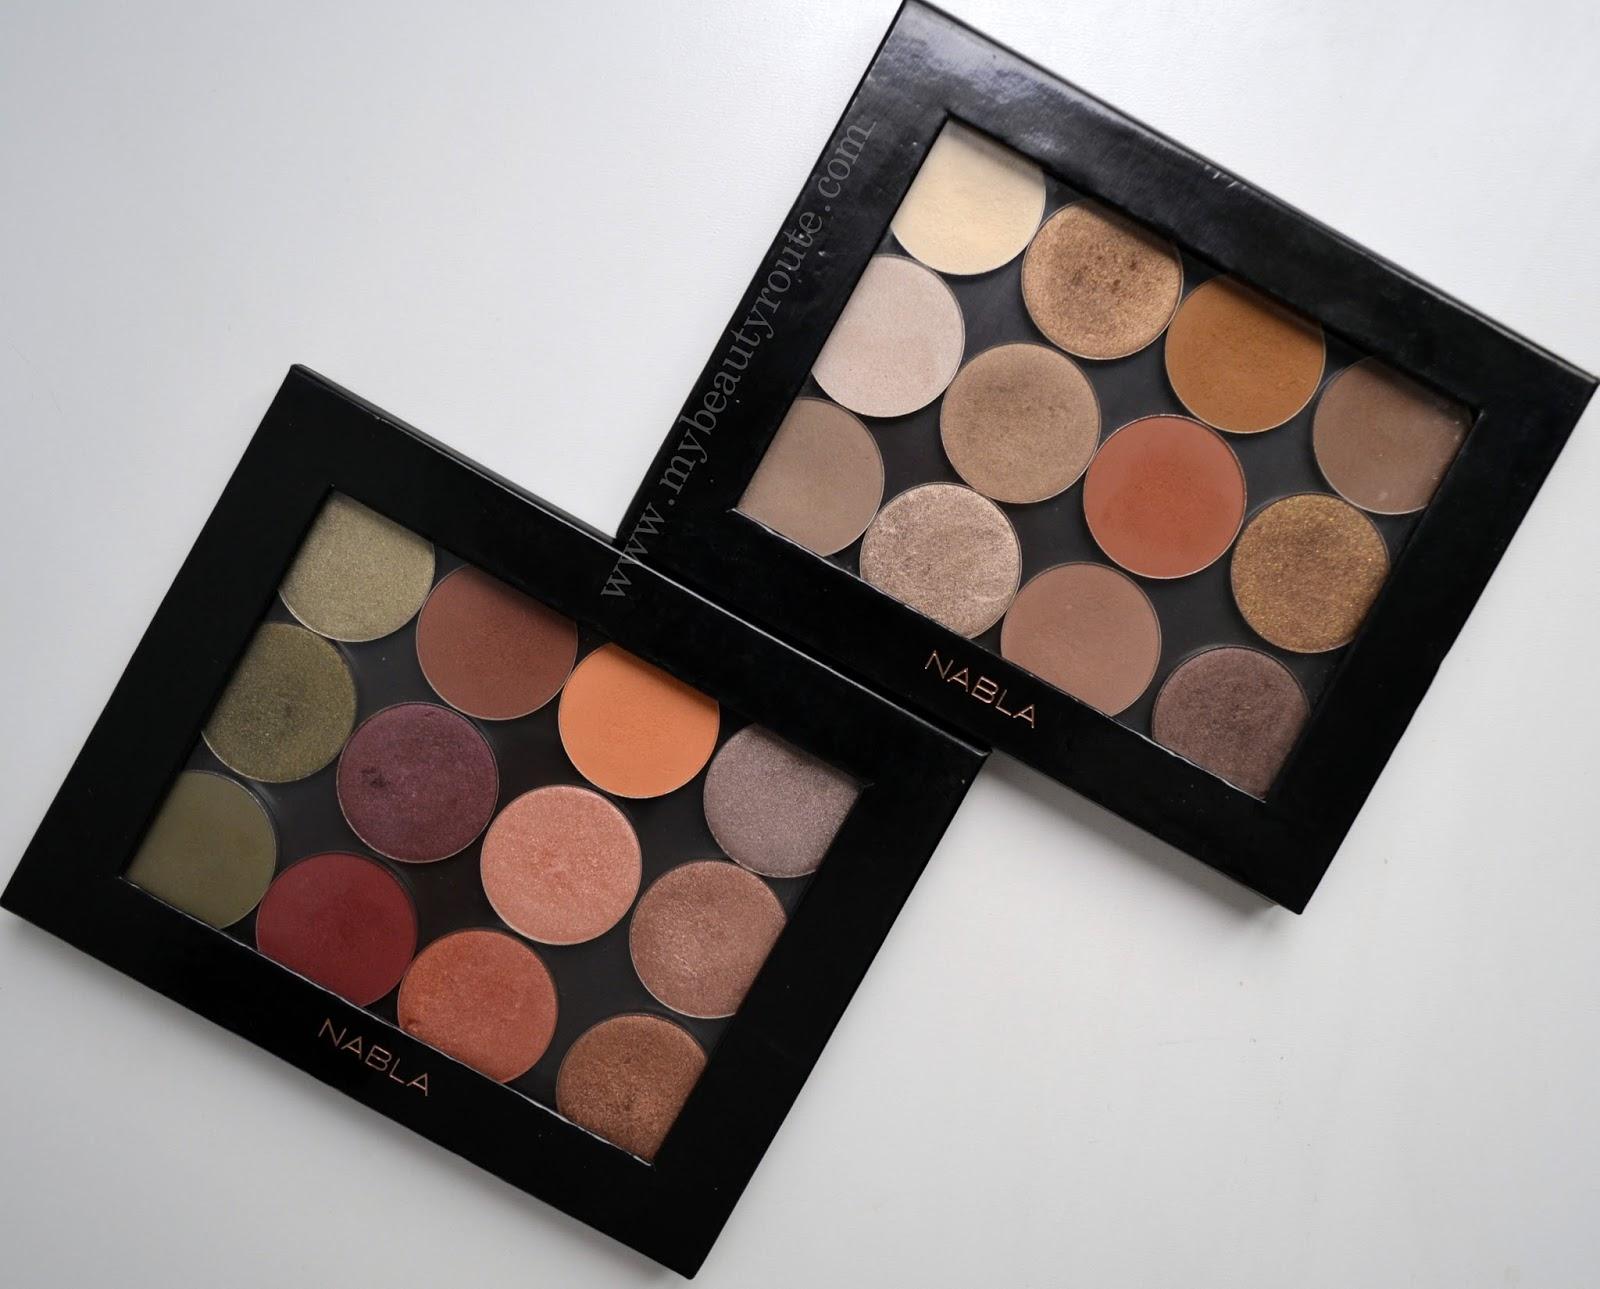 Paletas sombras de maquillaje tonos neutros Nabla cosmetics